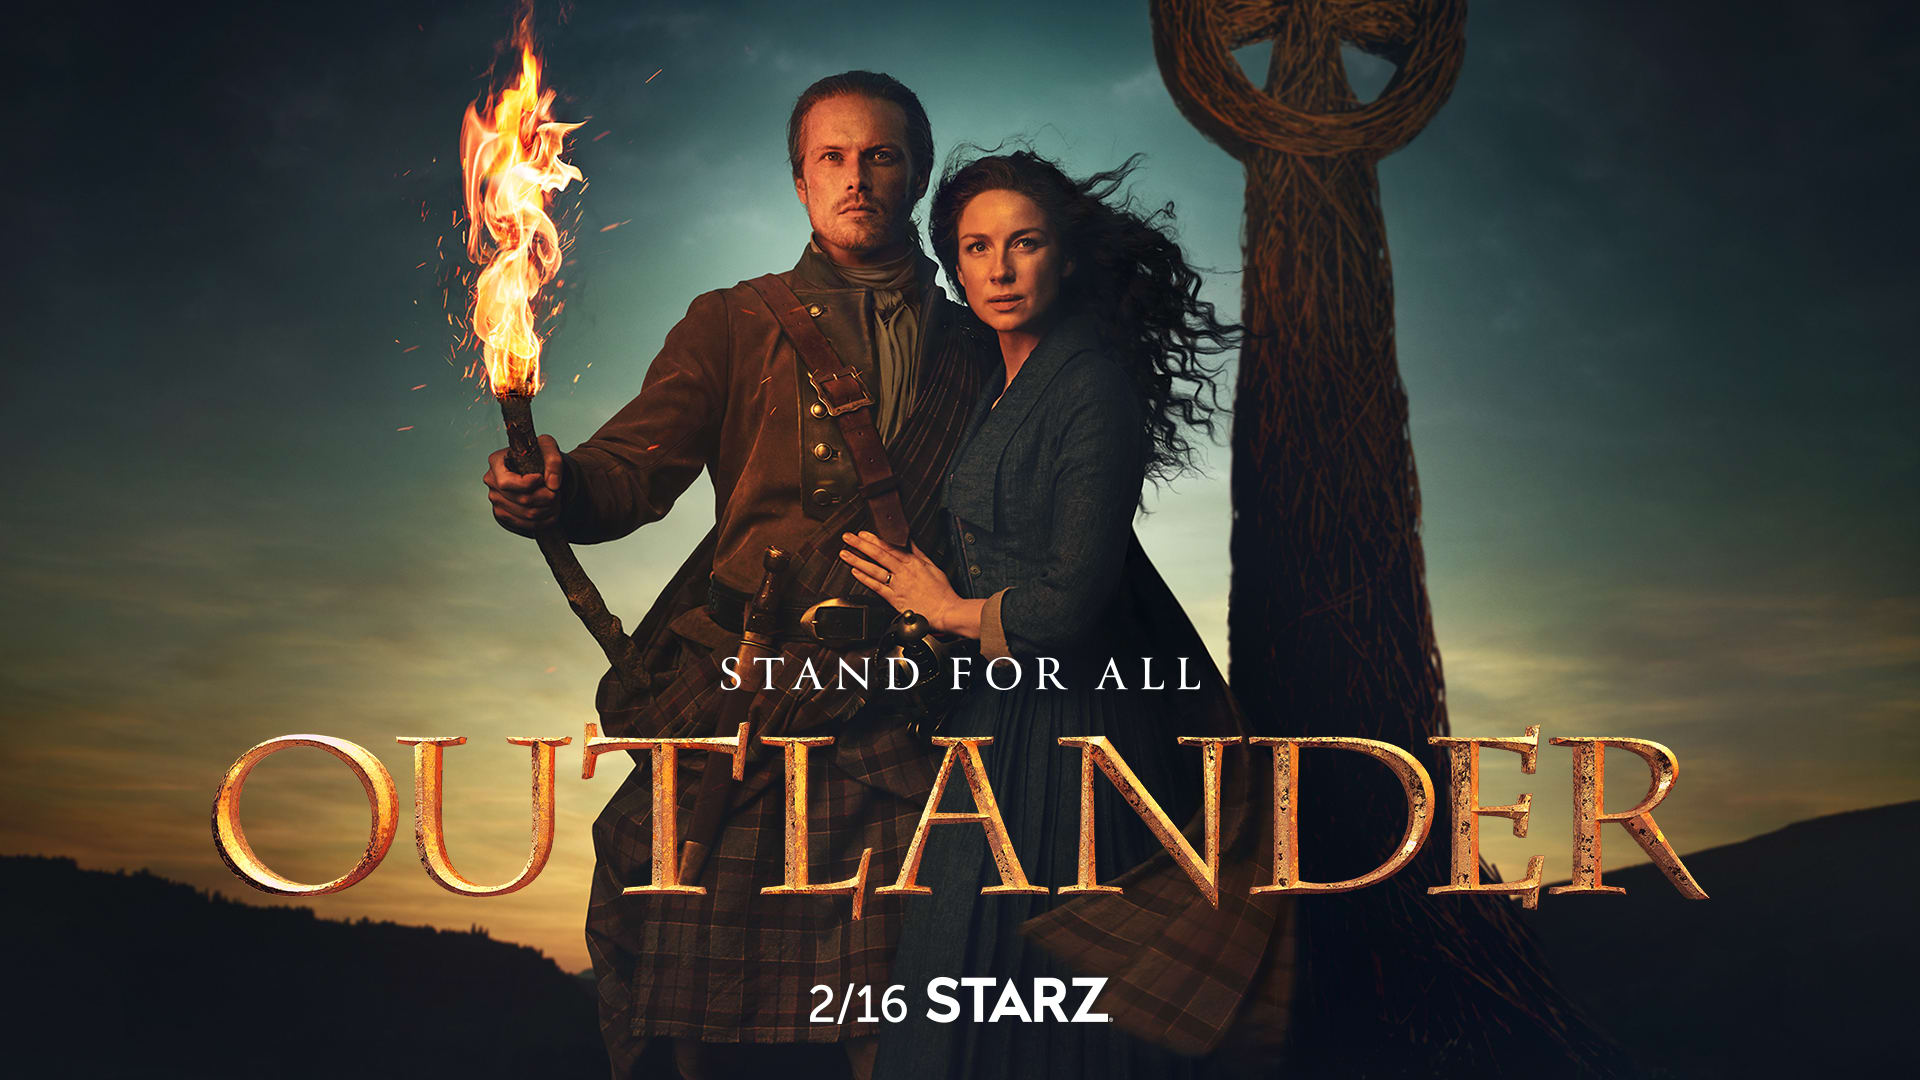 Outlander Season 6 Release Date Confirmed for 2021, Cast & Story Updates